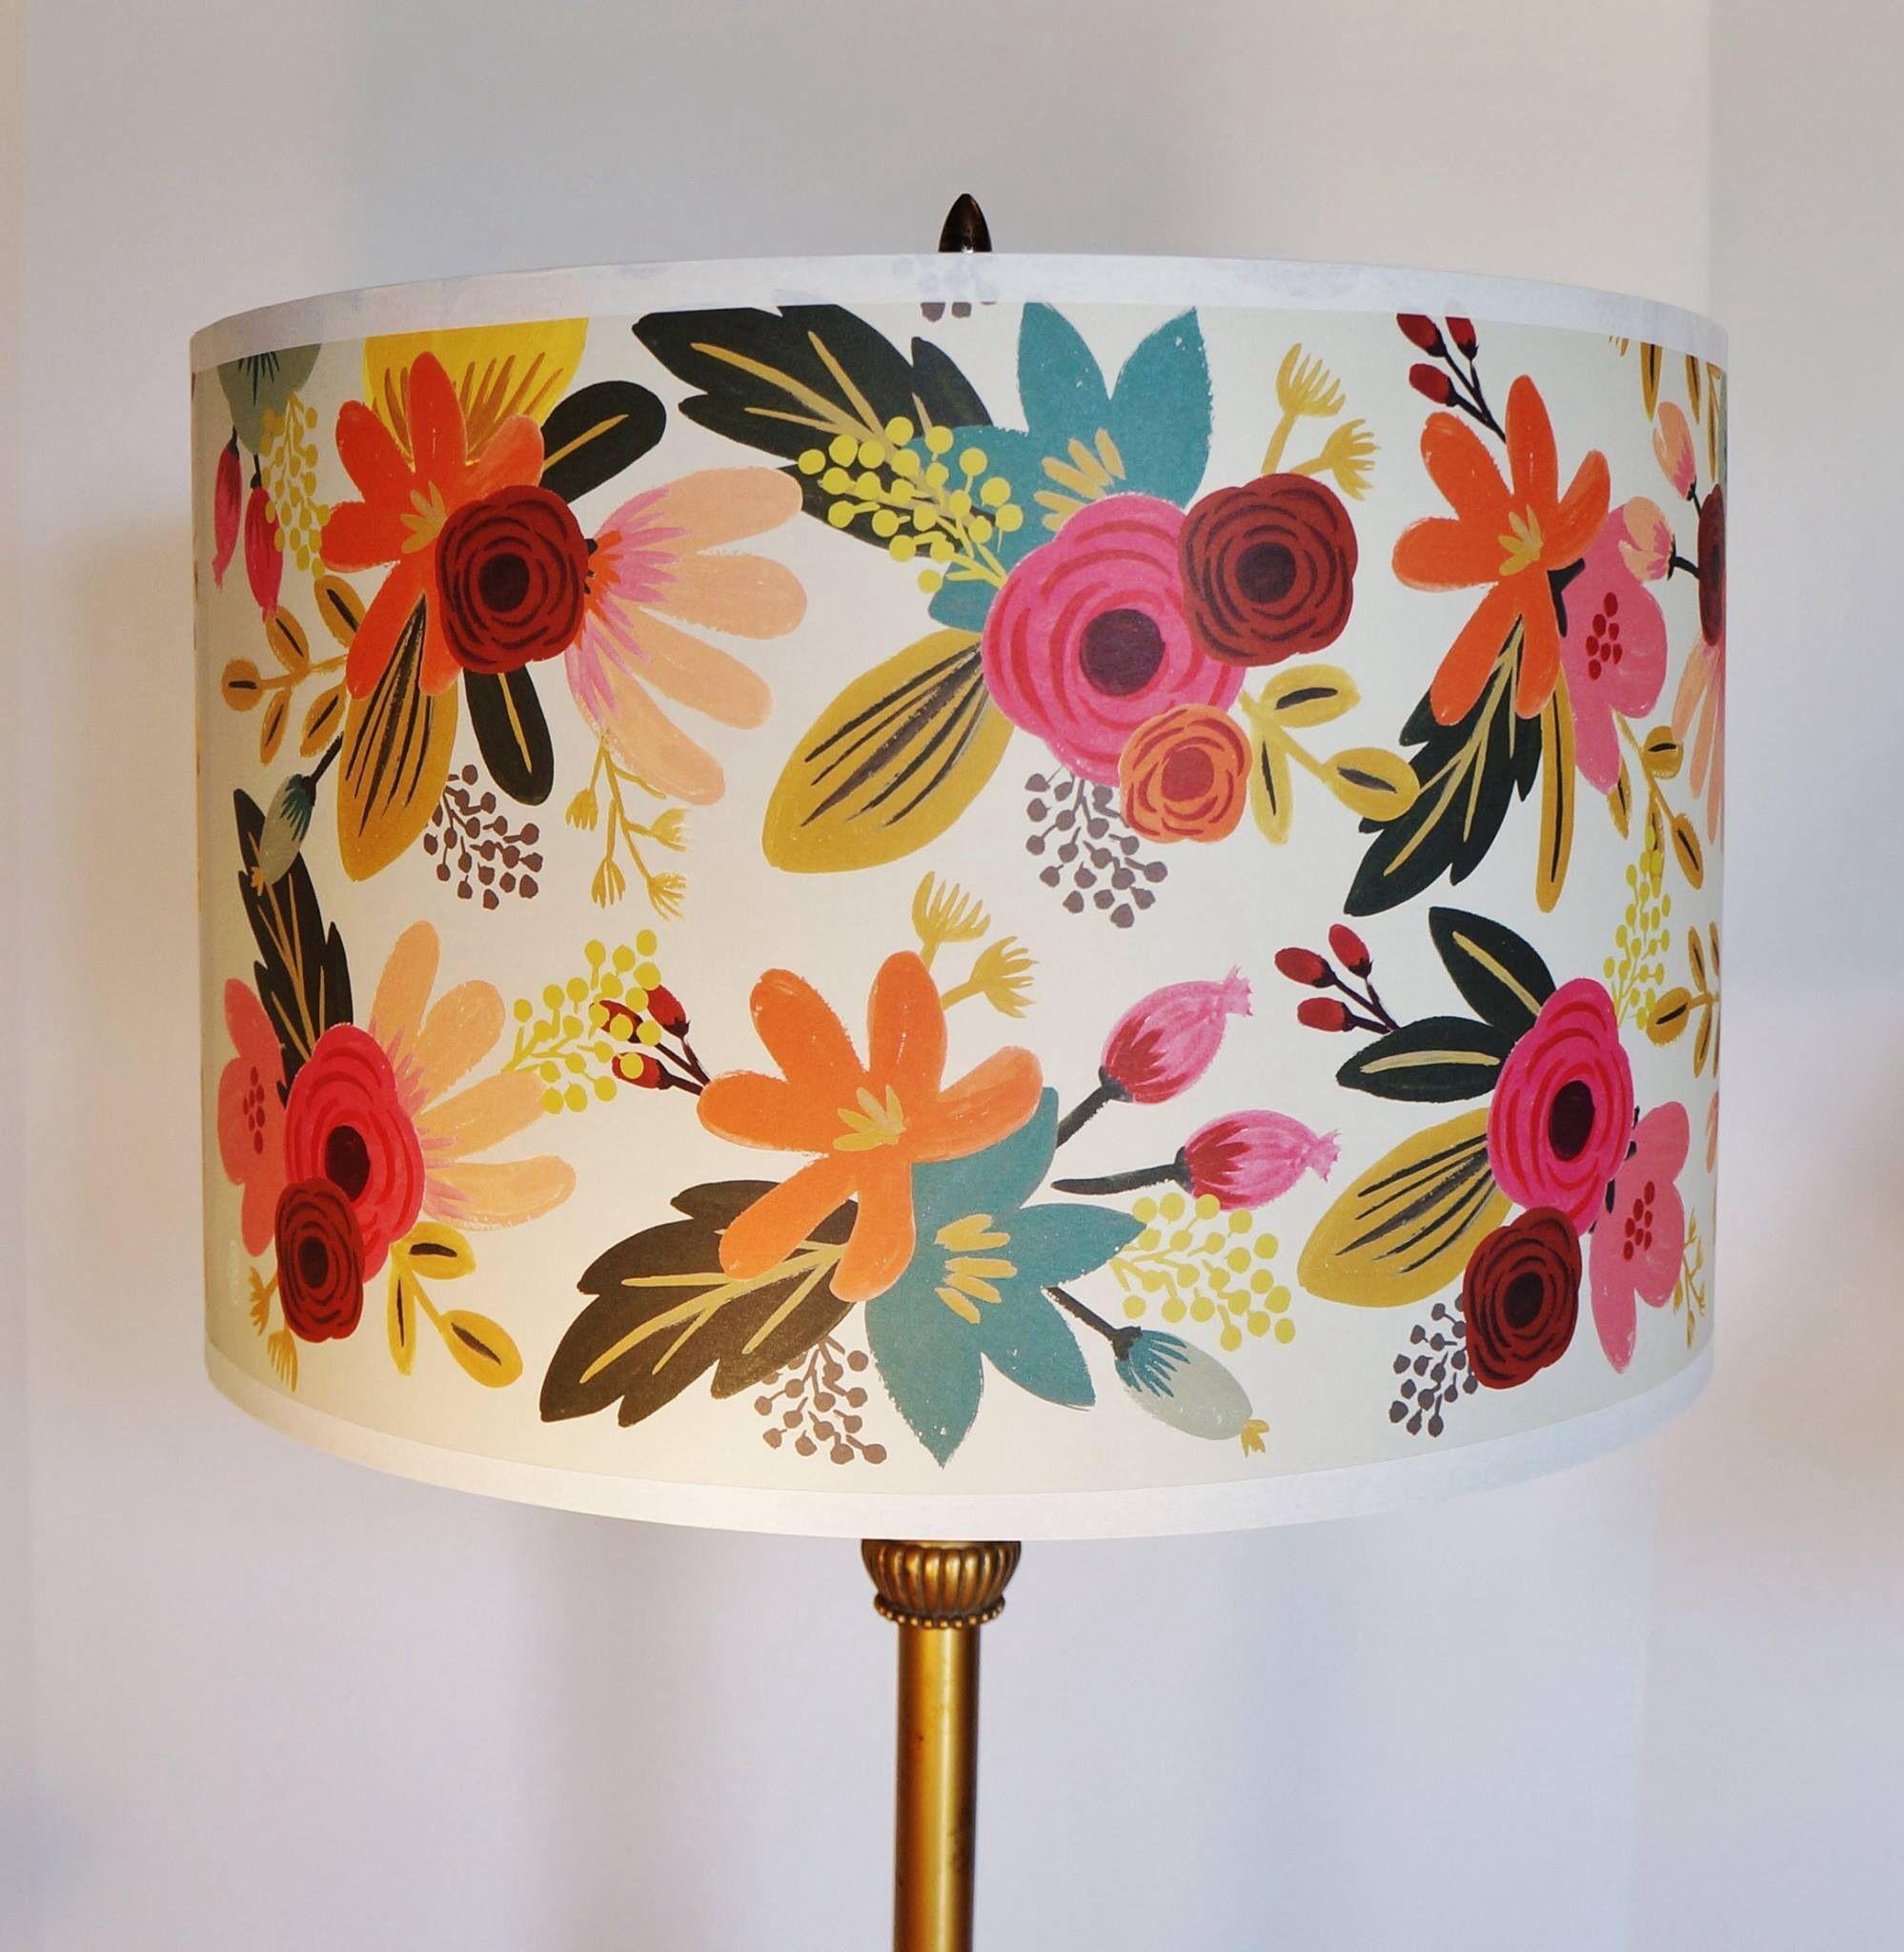 10 Friendly Simple Ideas Colorful Lamp Shades Ideas Lamp Shades Living Room Gray Lamp Shades Paper Fun Painting Lamp S Diy Lamp Shade Paper Lampshade Diy Lamp